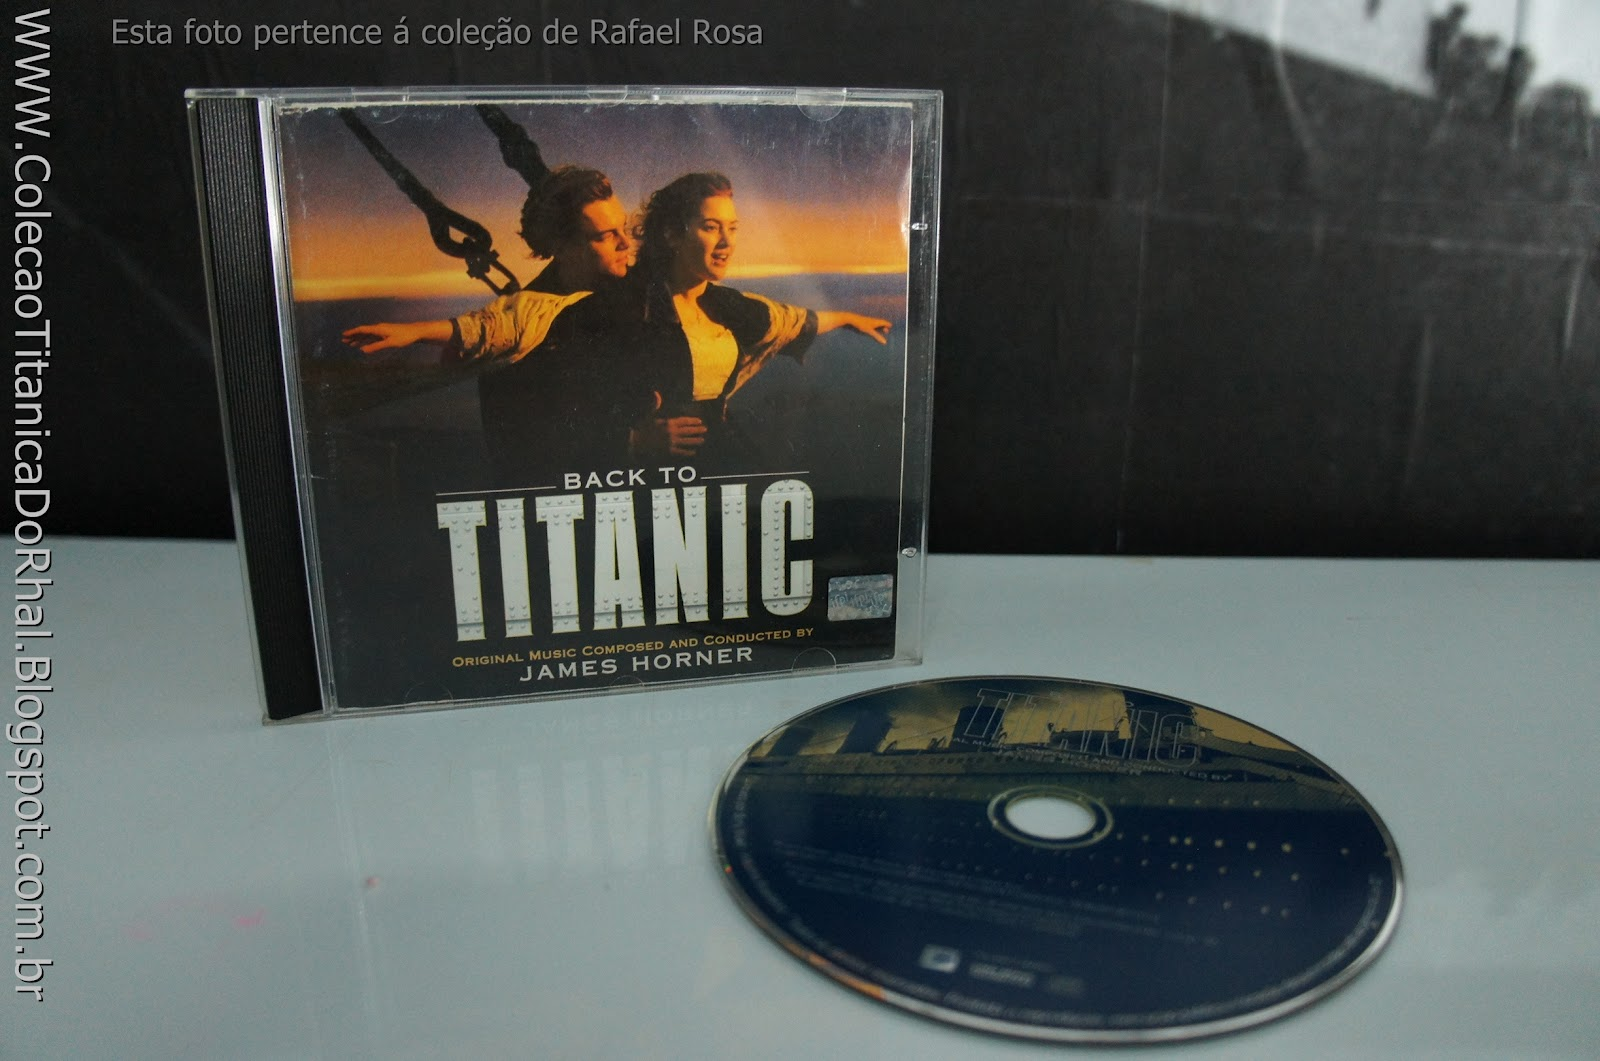 Titanic Third Class Menu Cd Back To Titanic A Cole 231 227 O Tit 226 Nica Do Rhal